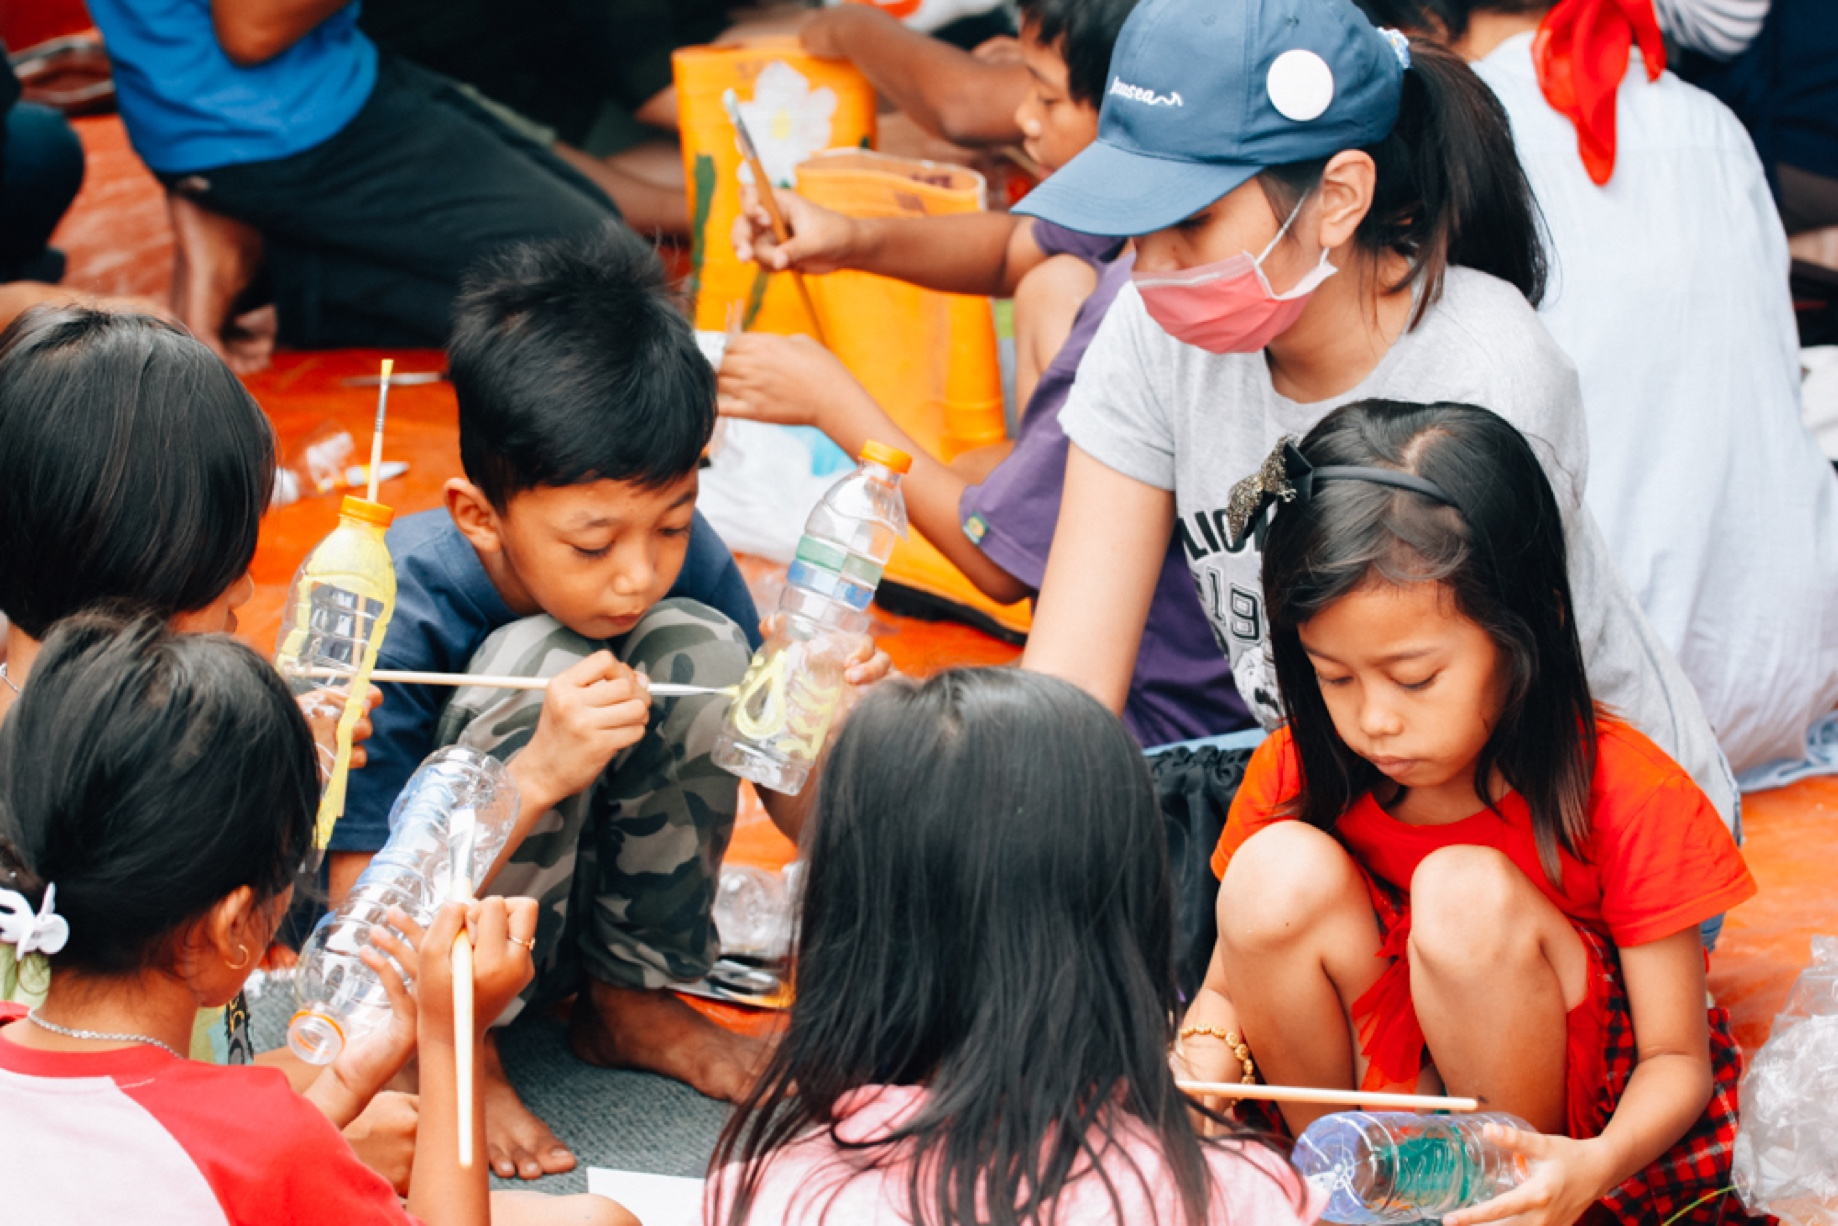 Aktivitas mendaur ulang botol plastik bersama warga lokal